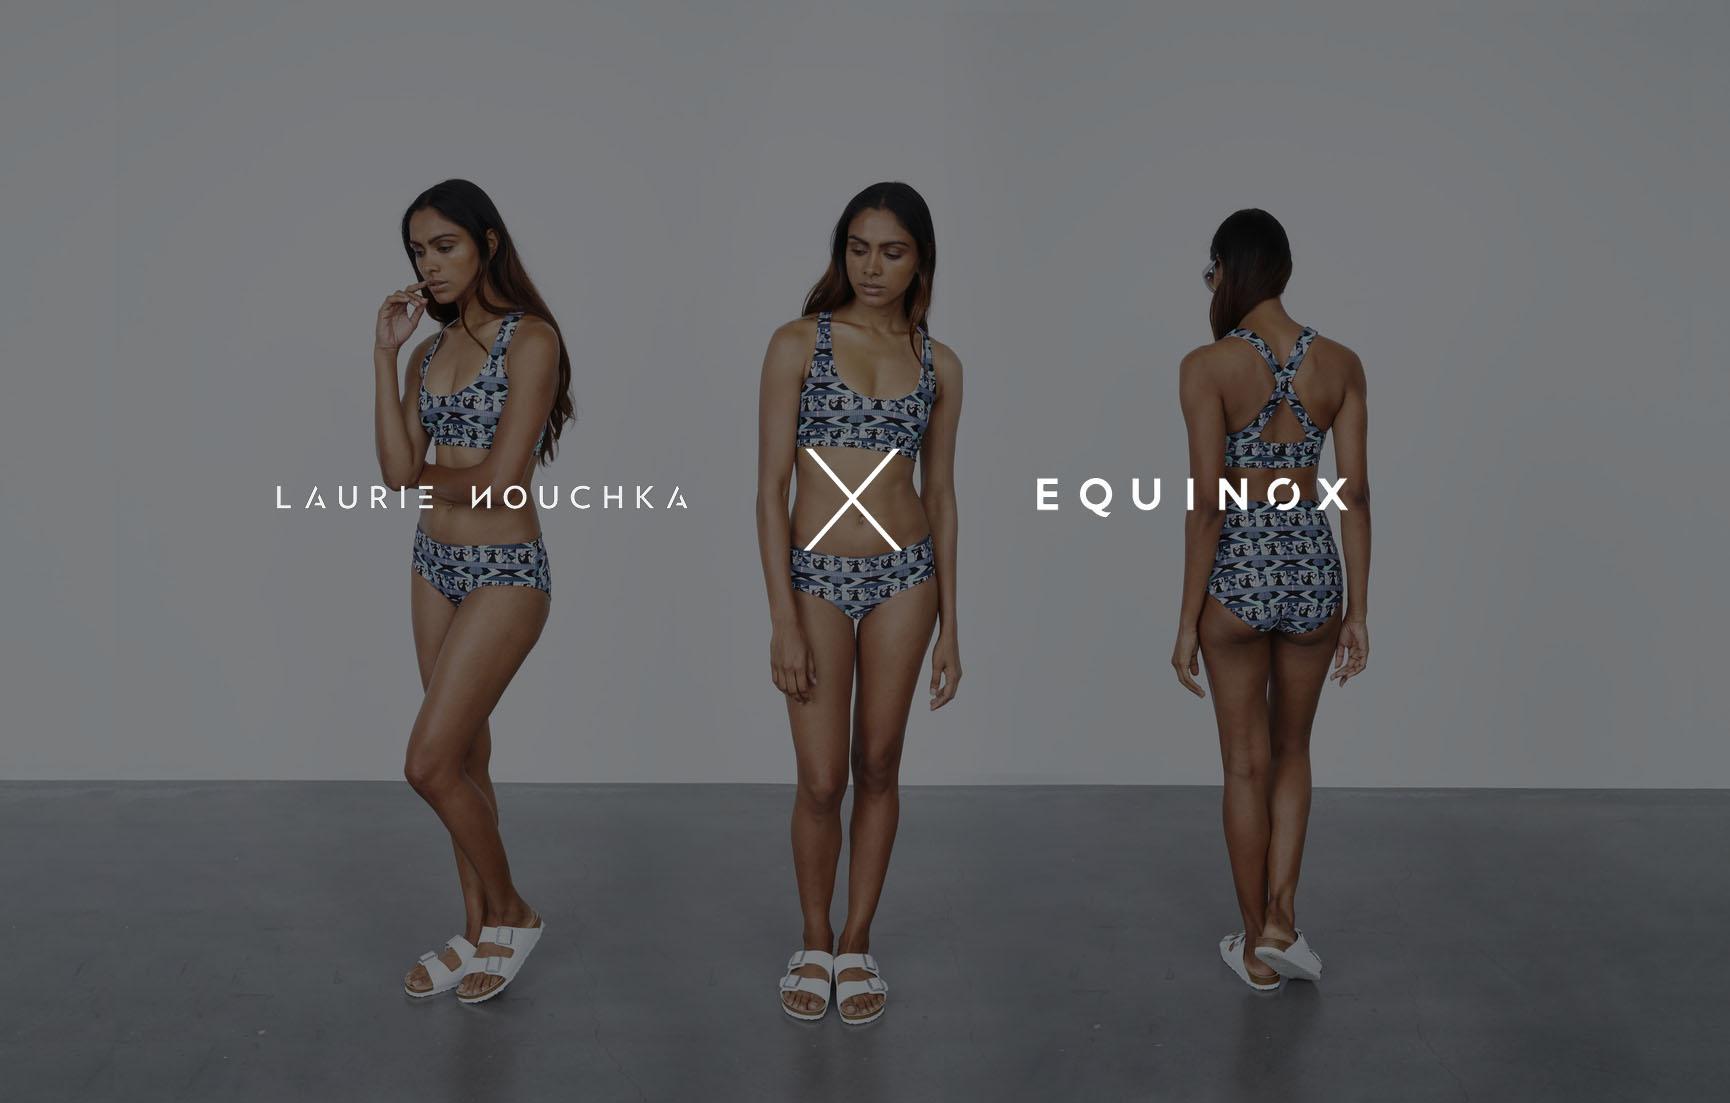 bespoke equinox.jpg